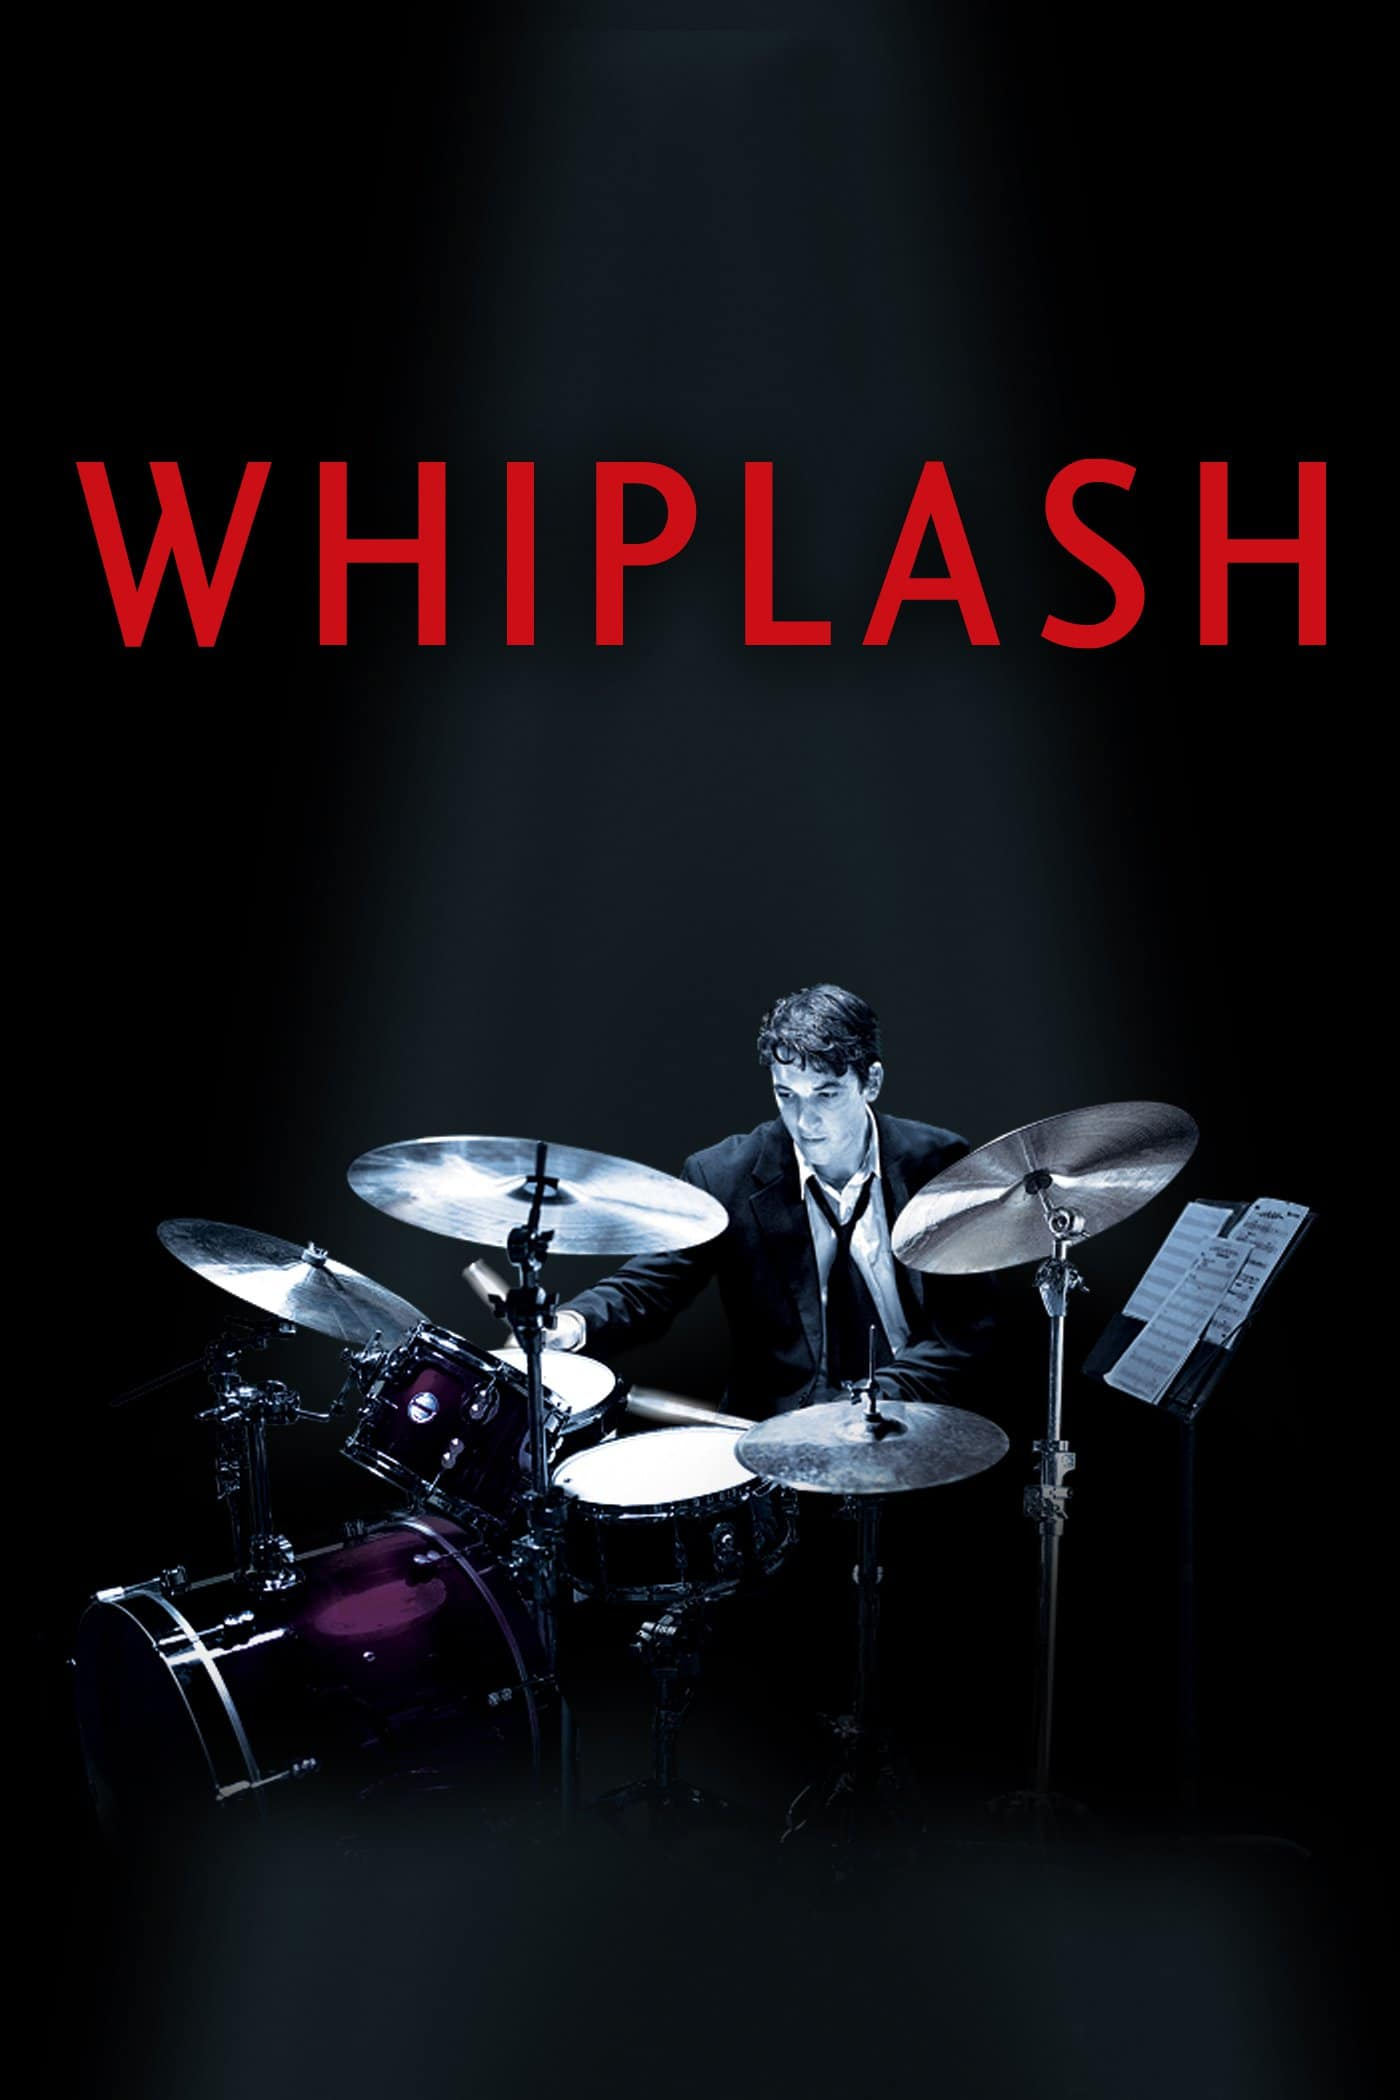 Whiplash, 2014